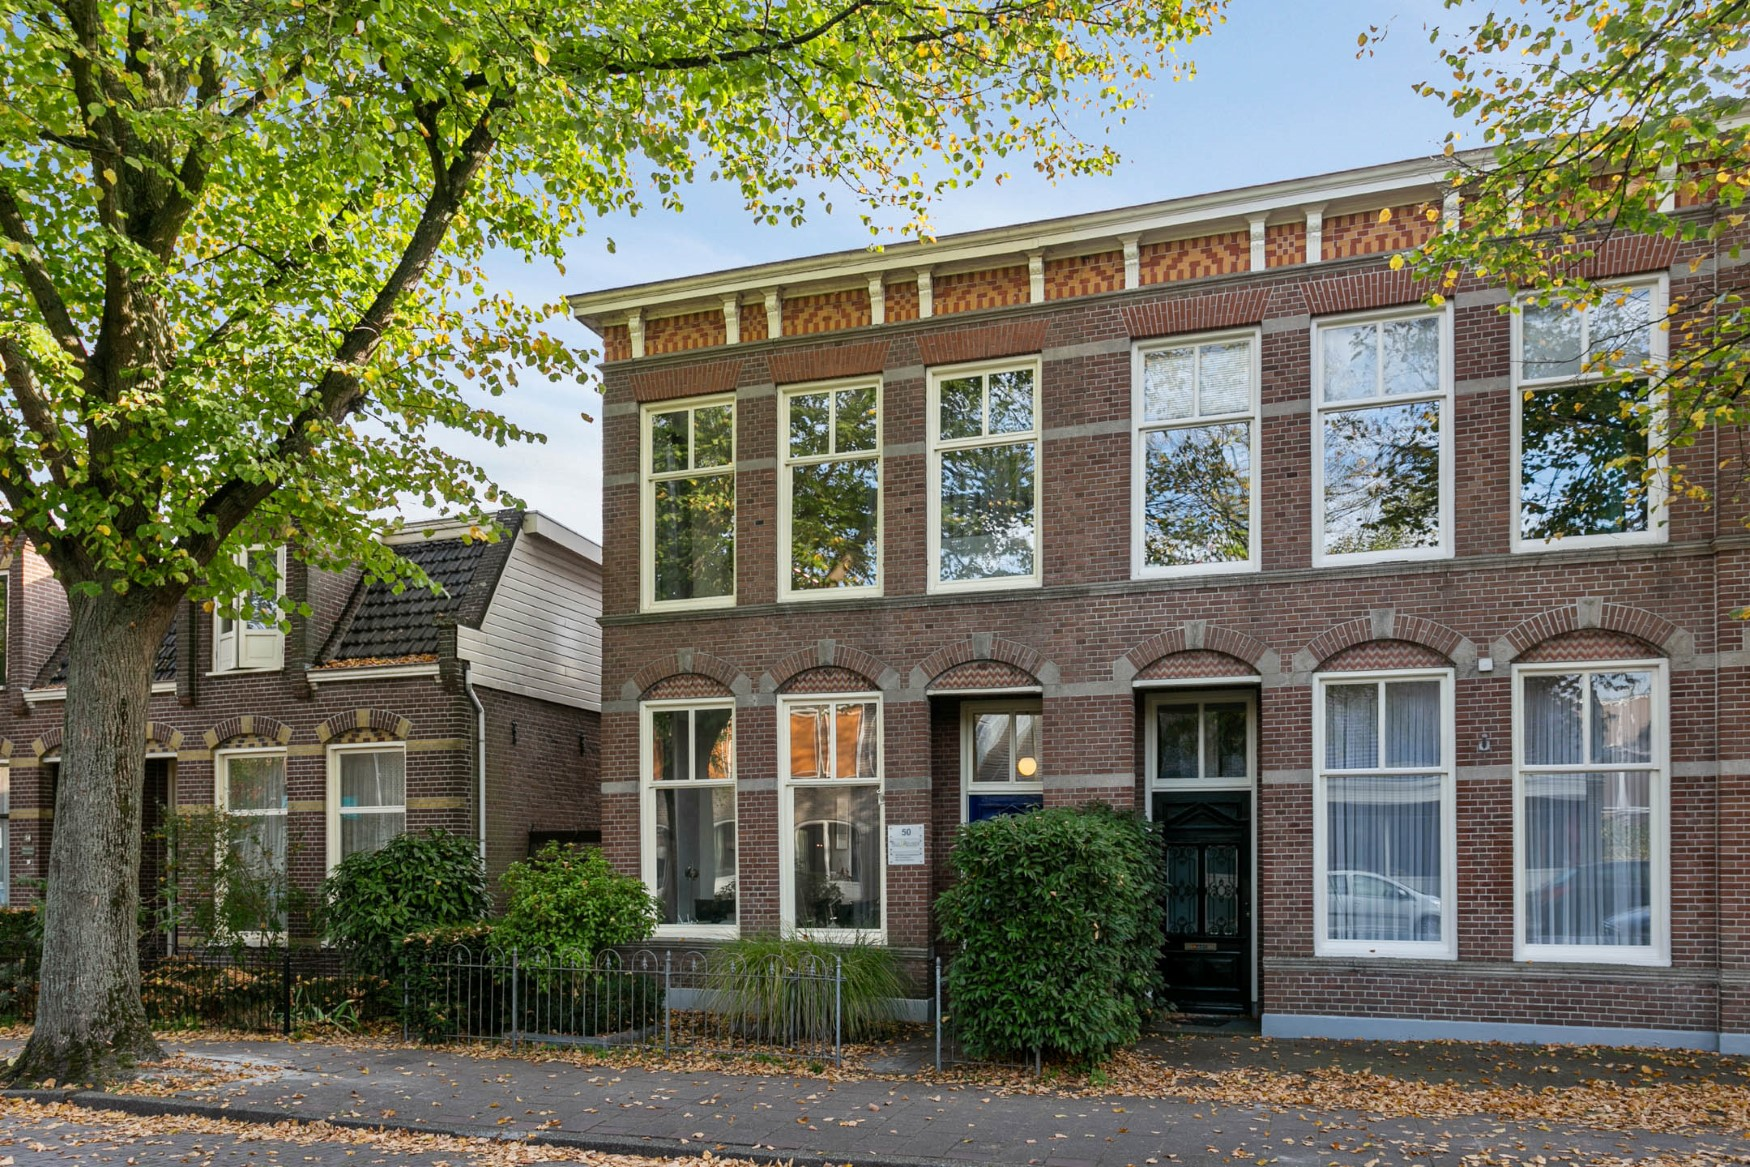 1ee117d5734 VERKOCHT: Koepoortsweg 50, Hoorn - Westfries Goed Makelaars & Adviseurs